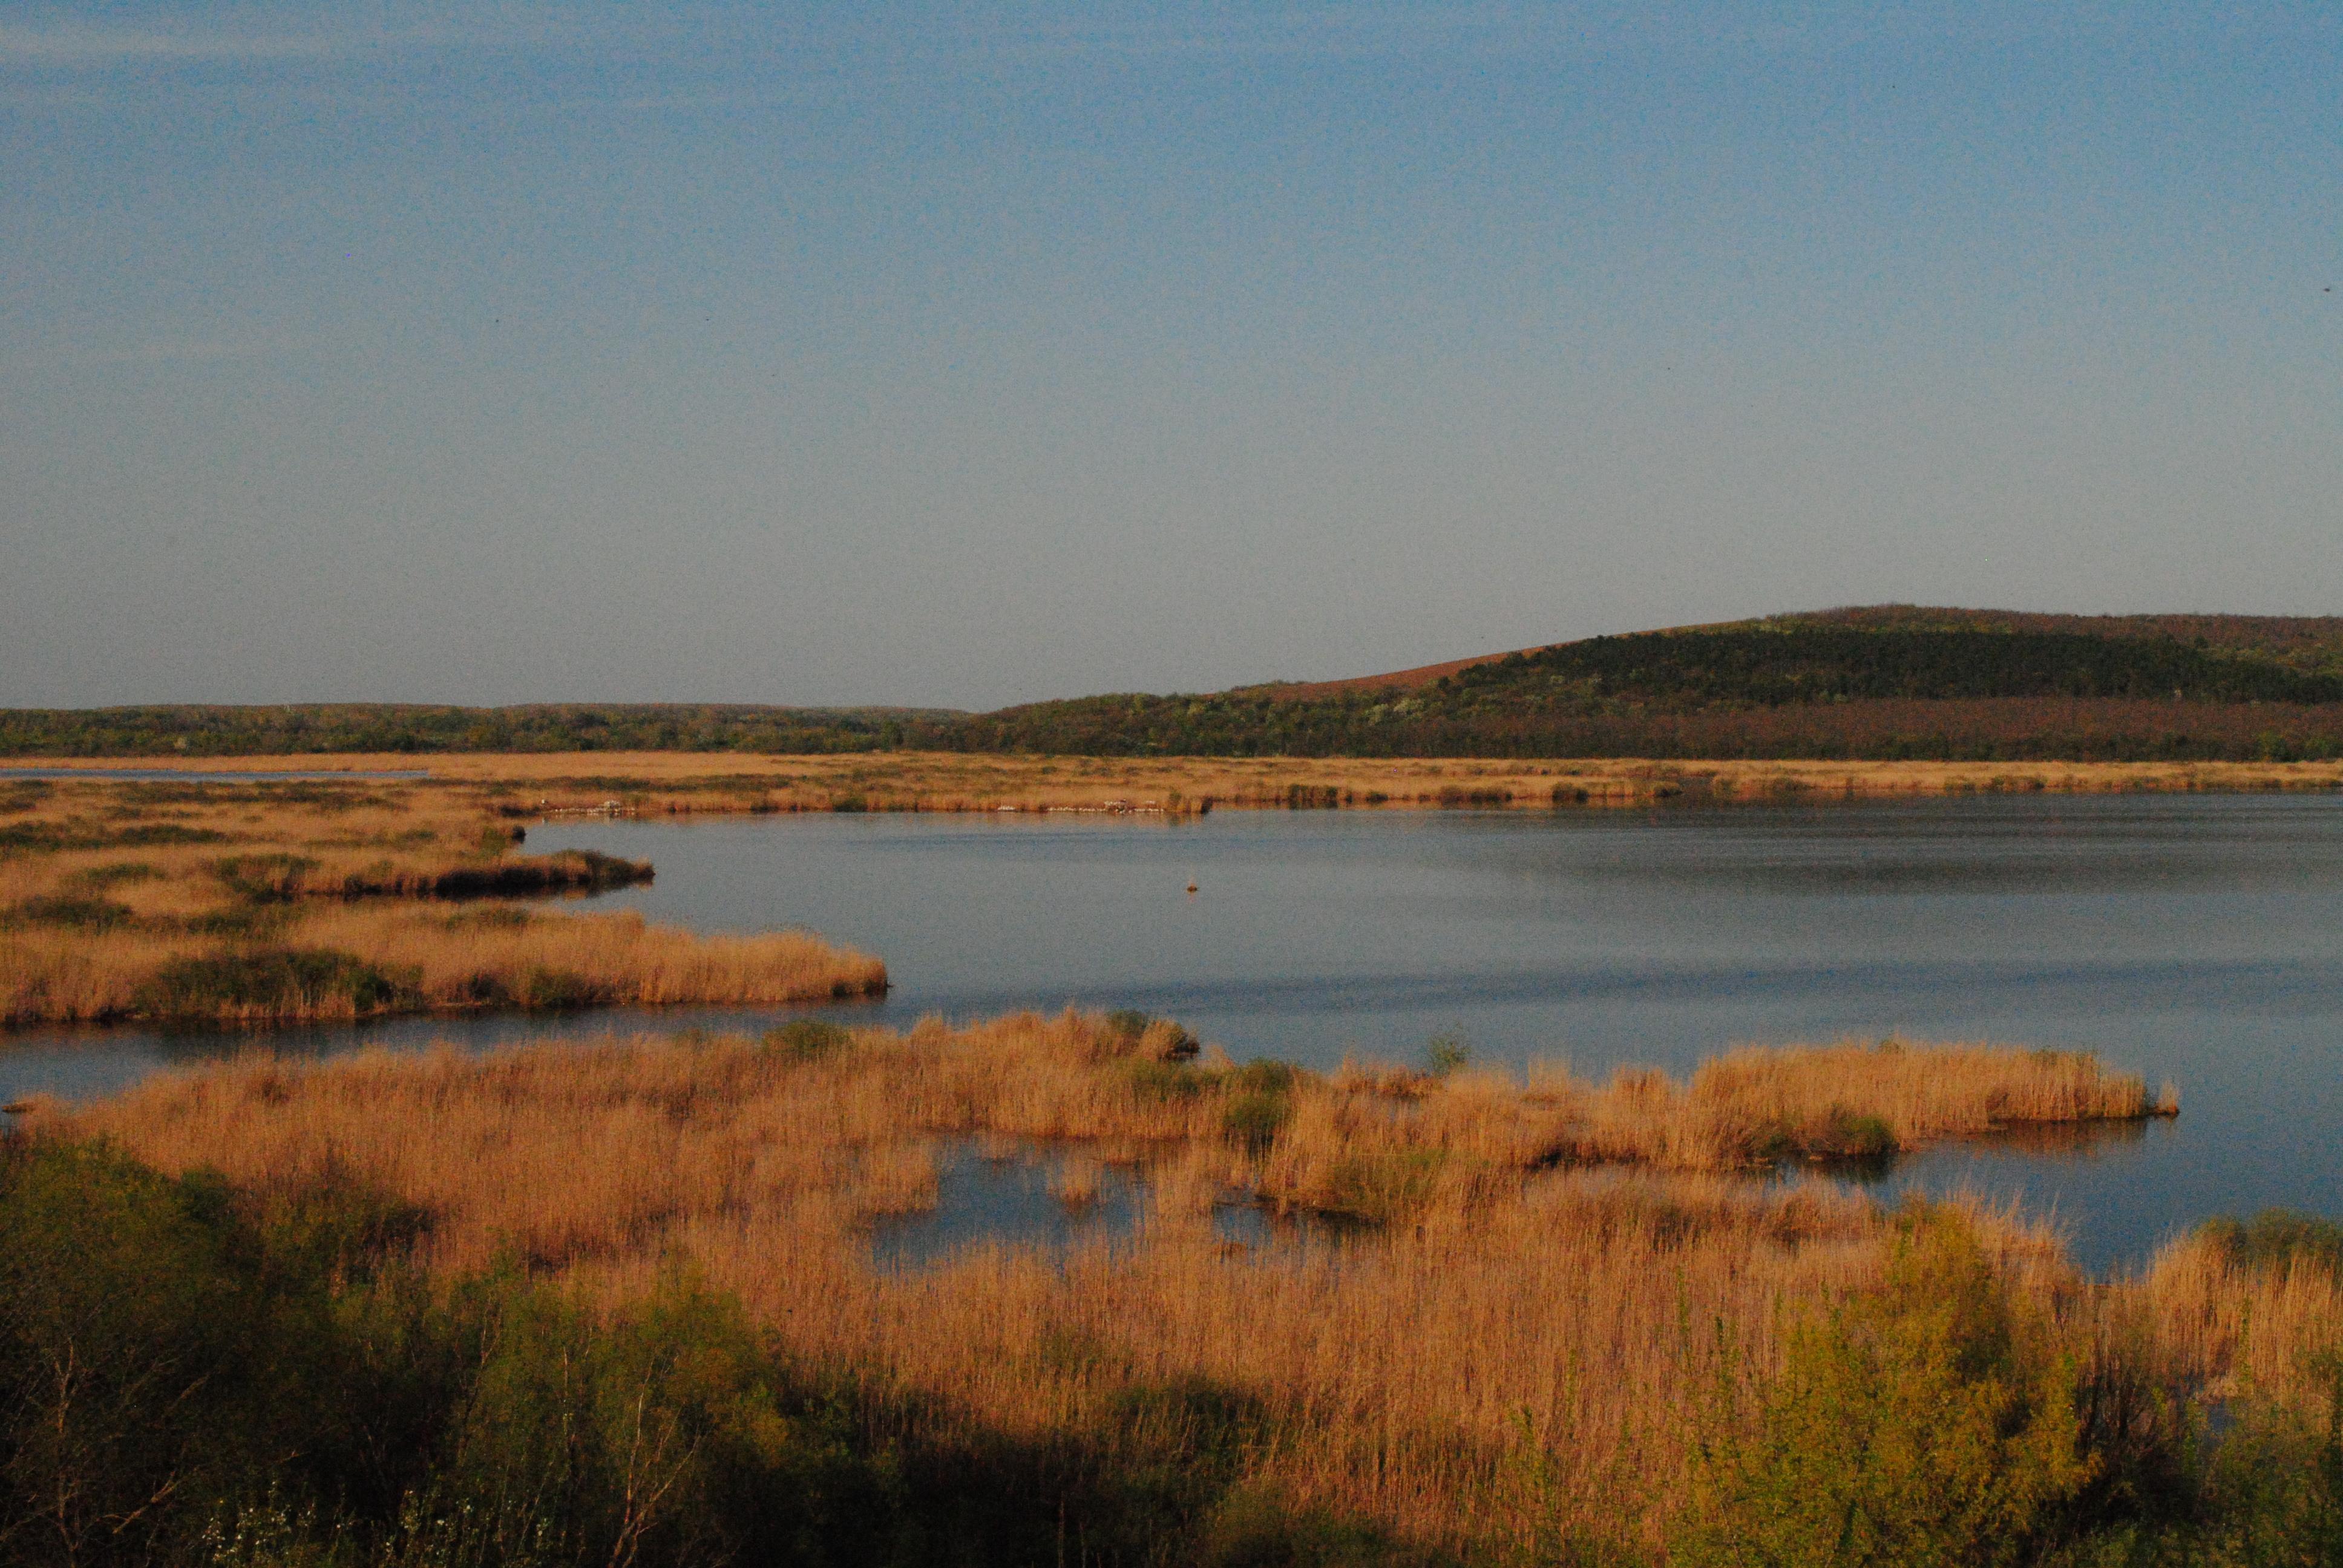 Rezervația naturală Srebărna